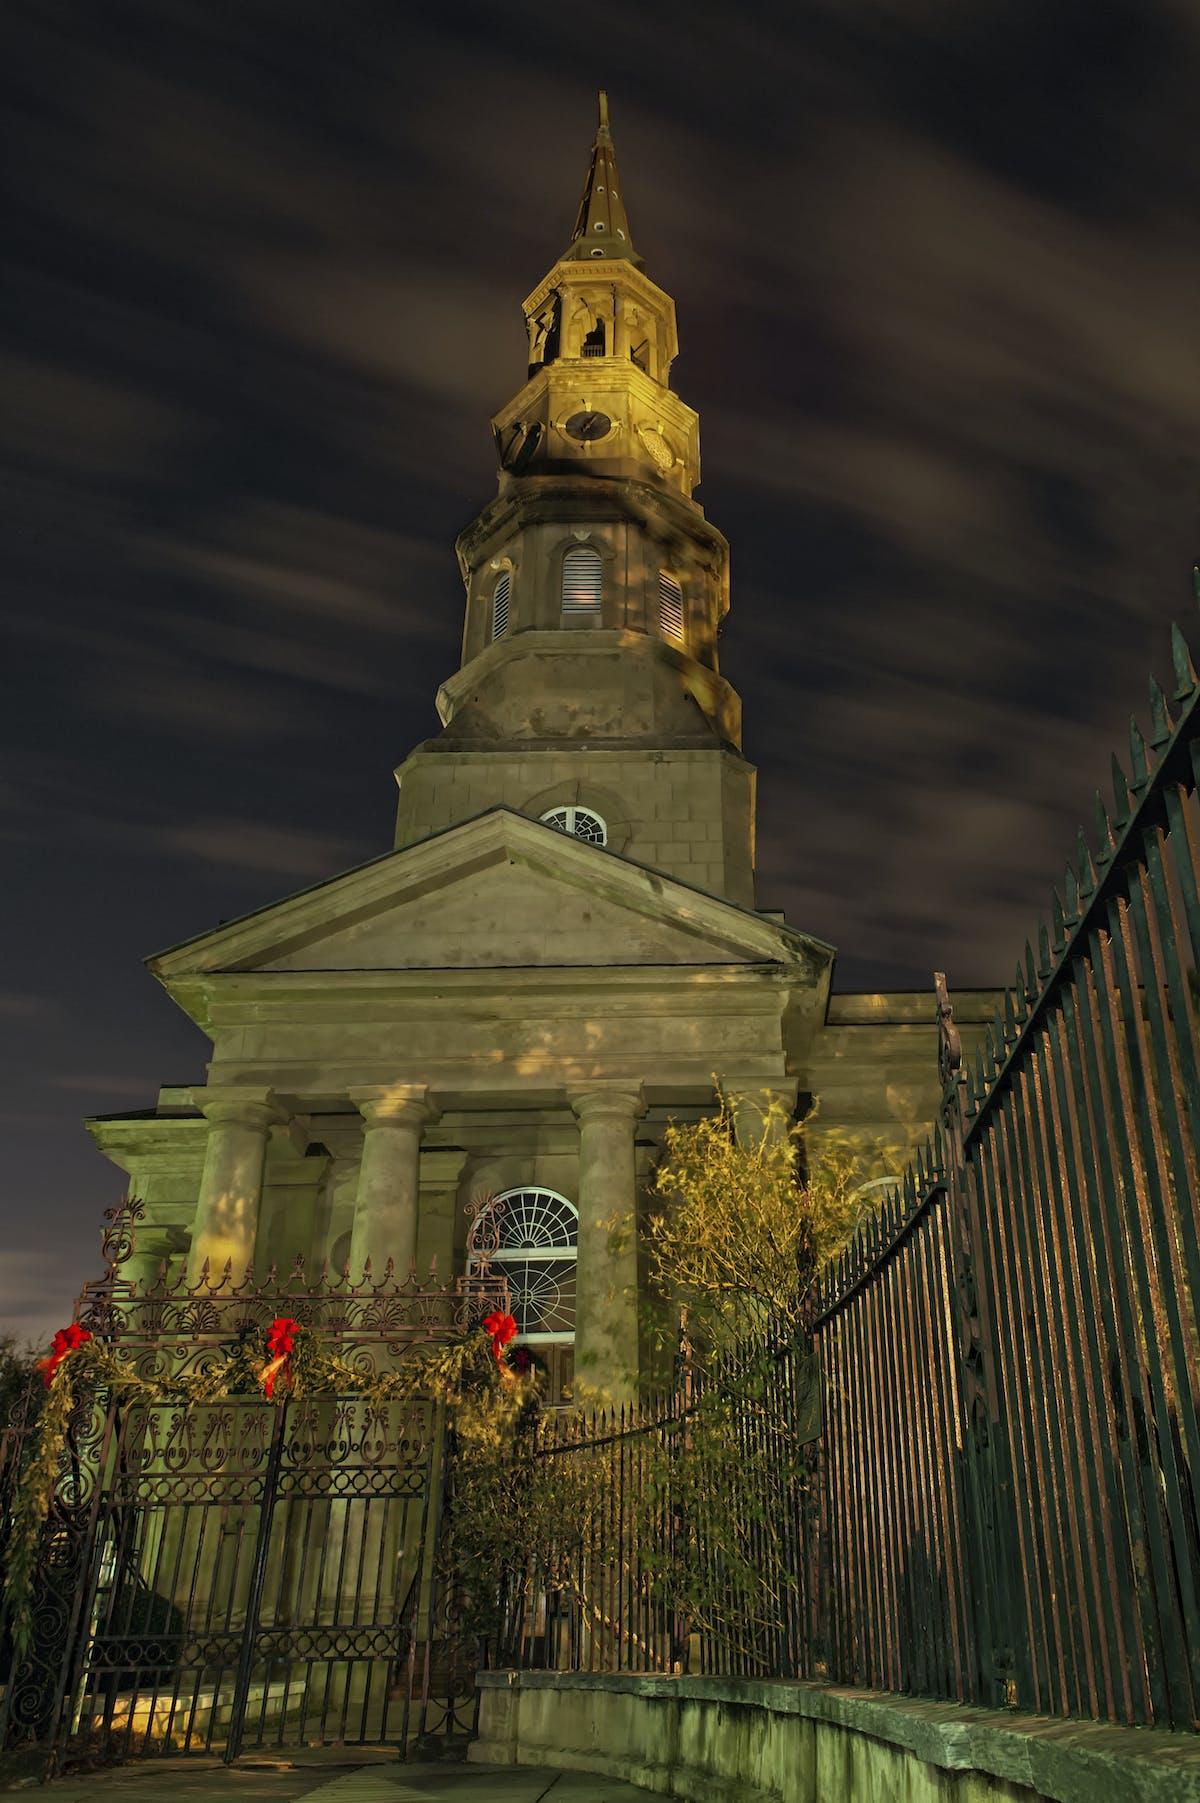 Charleston Sc Halloween Events 2020 Halloween In Charleston, SC (Updated 2020) | Walks Of Charleston